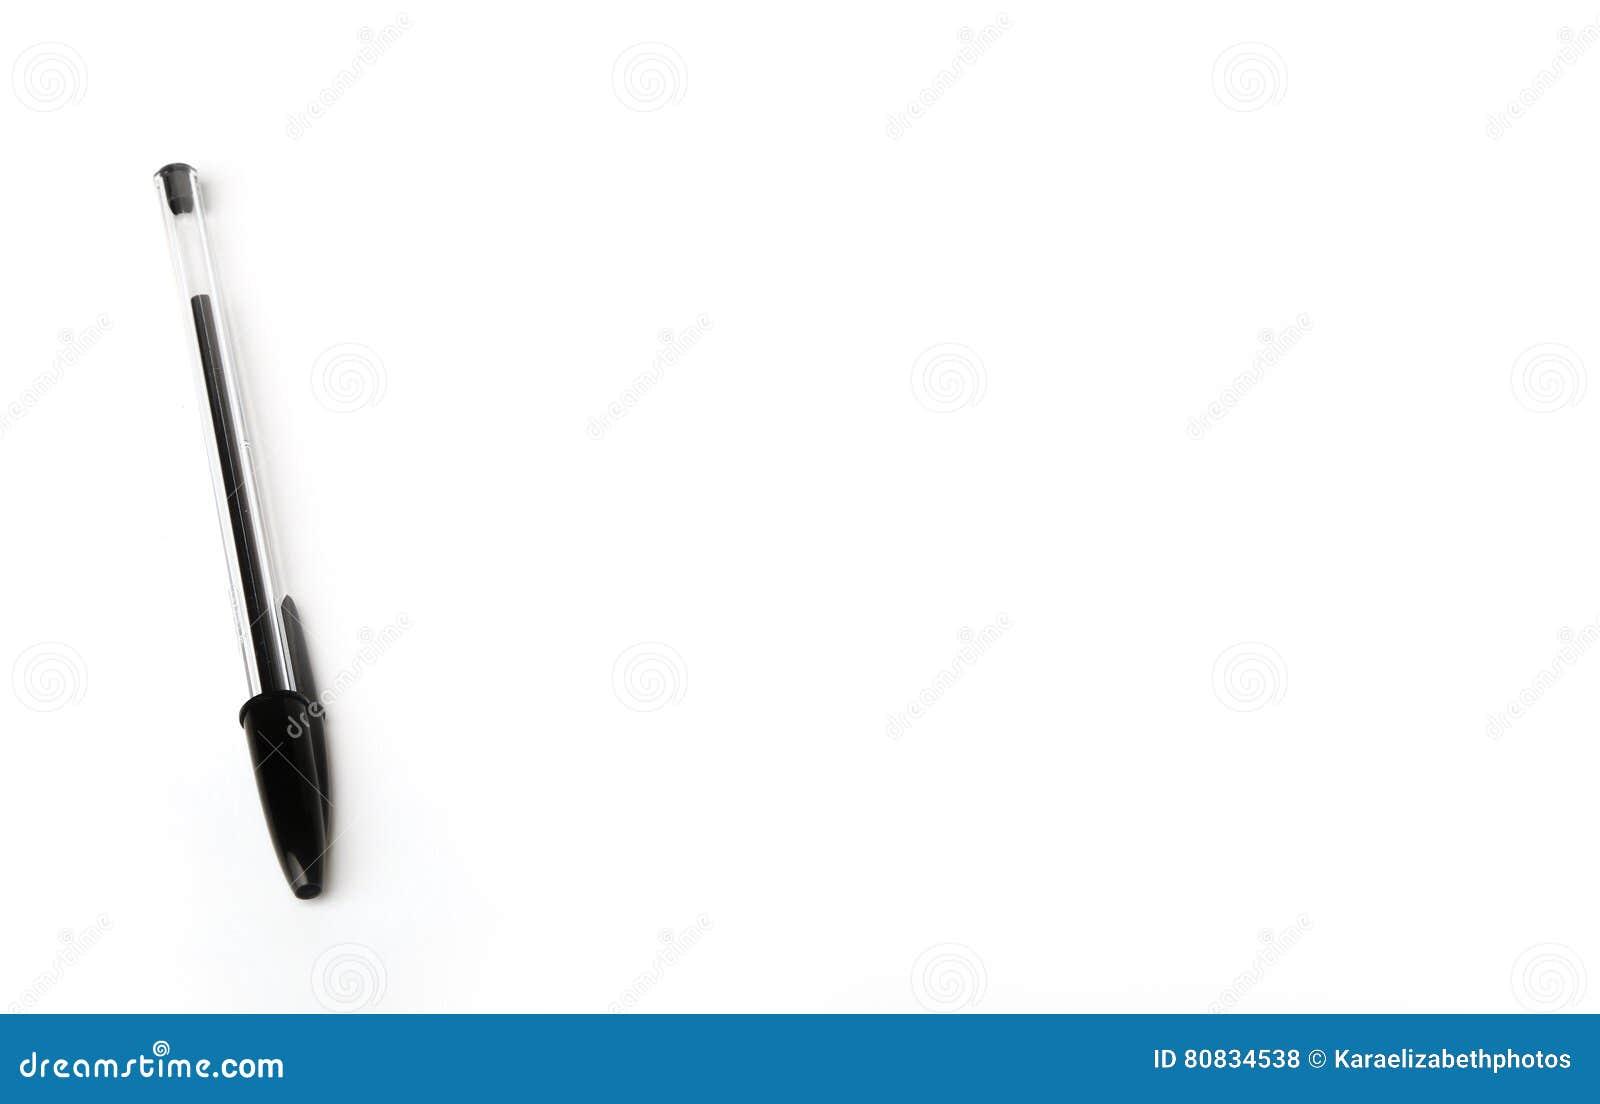 Black Biro Pens On A White Background Stock Photo - Image of